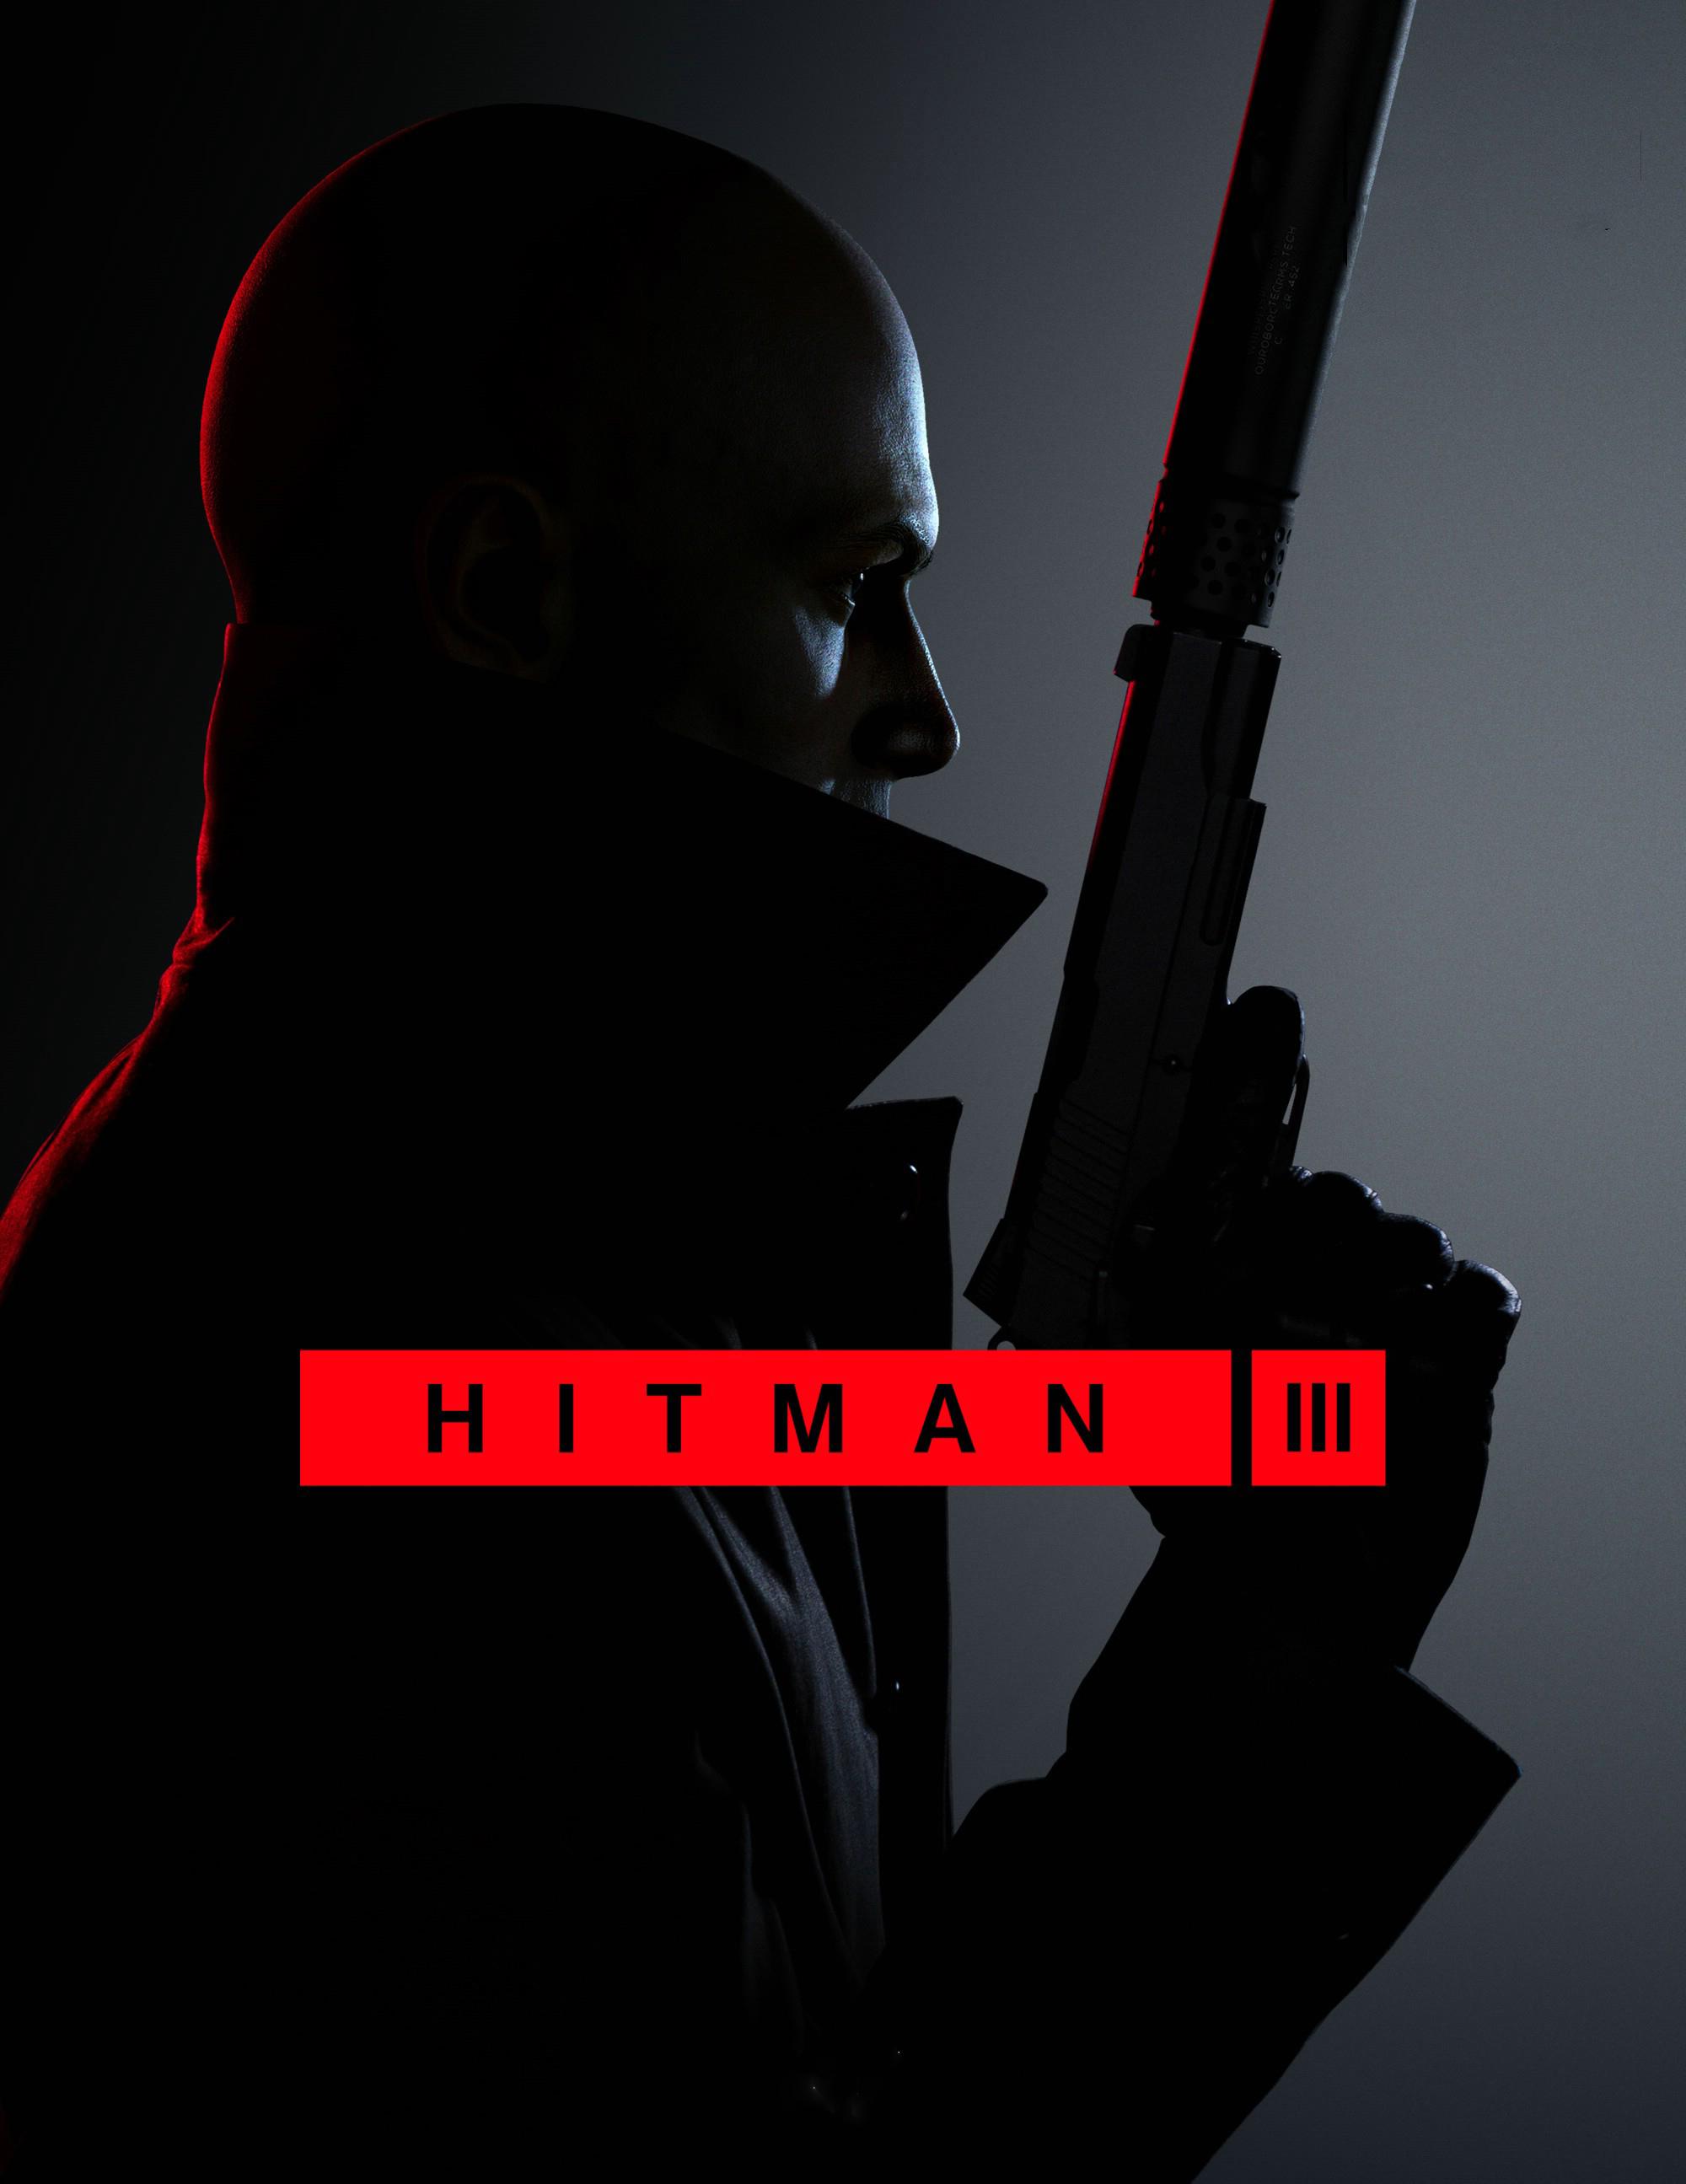 Hitman 3 Key Art Wallpaper Hd Games 4k Wallpapers Images Photos